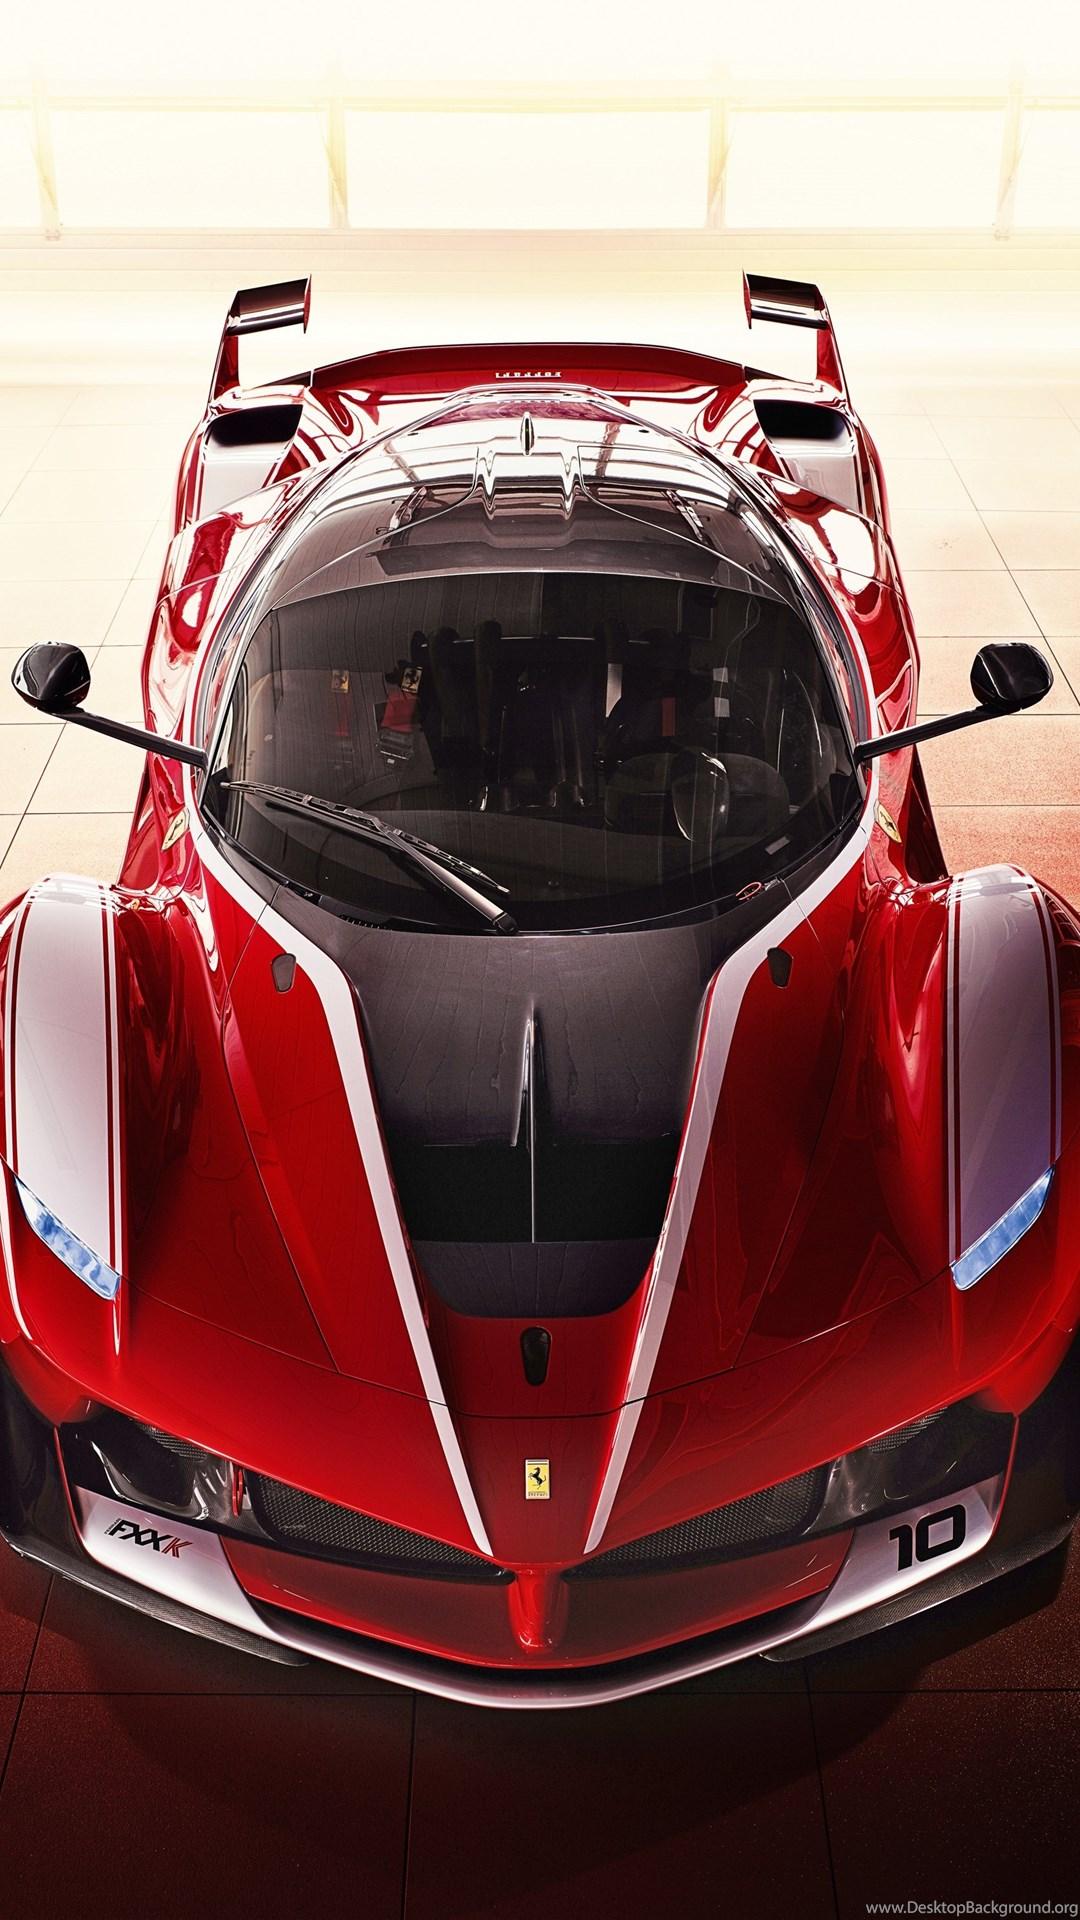 2015 Ferrari Fxx K Supercar Fxxk Wallpapers Desktop Background